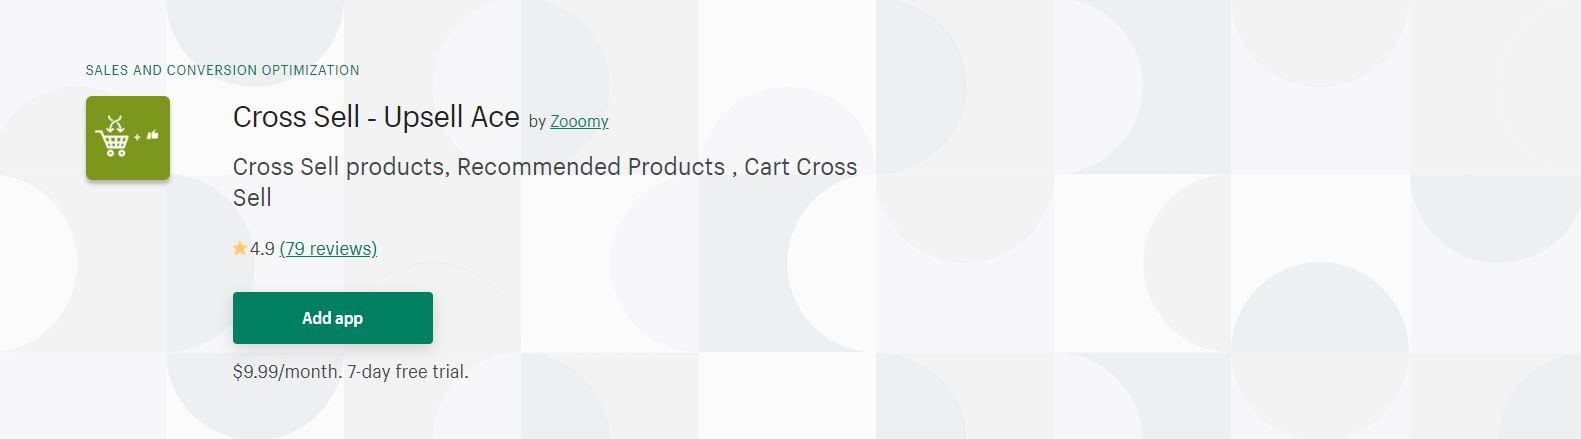 Cross Sell ‑ Upsell Ace